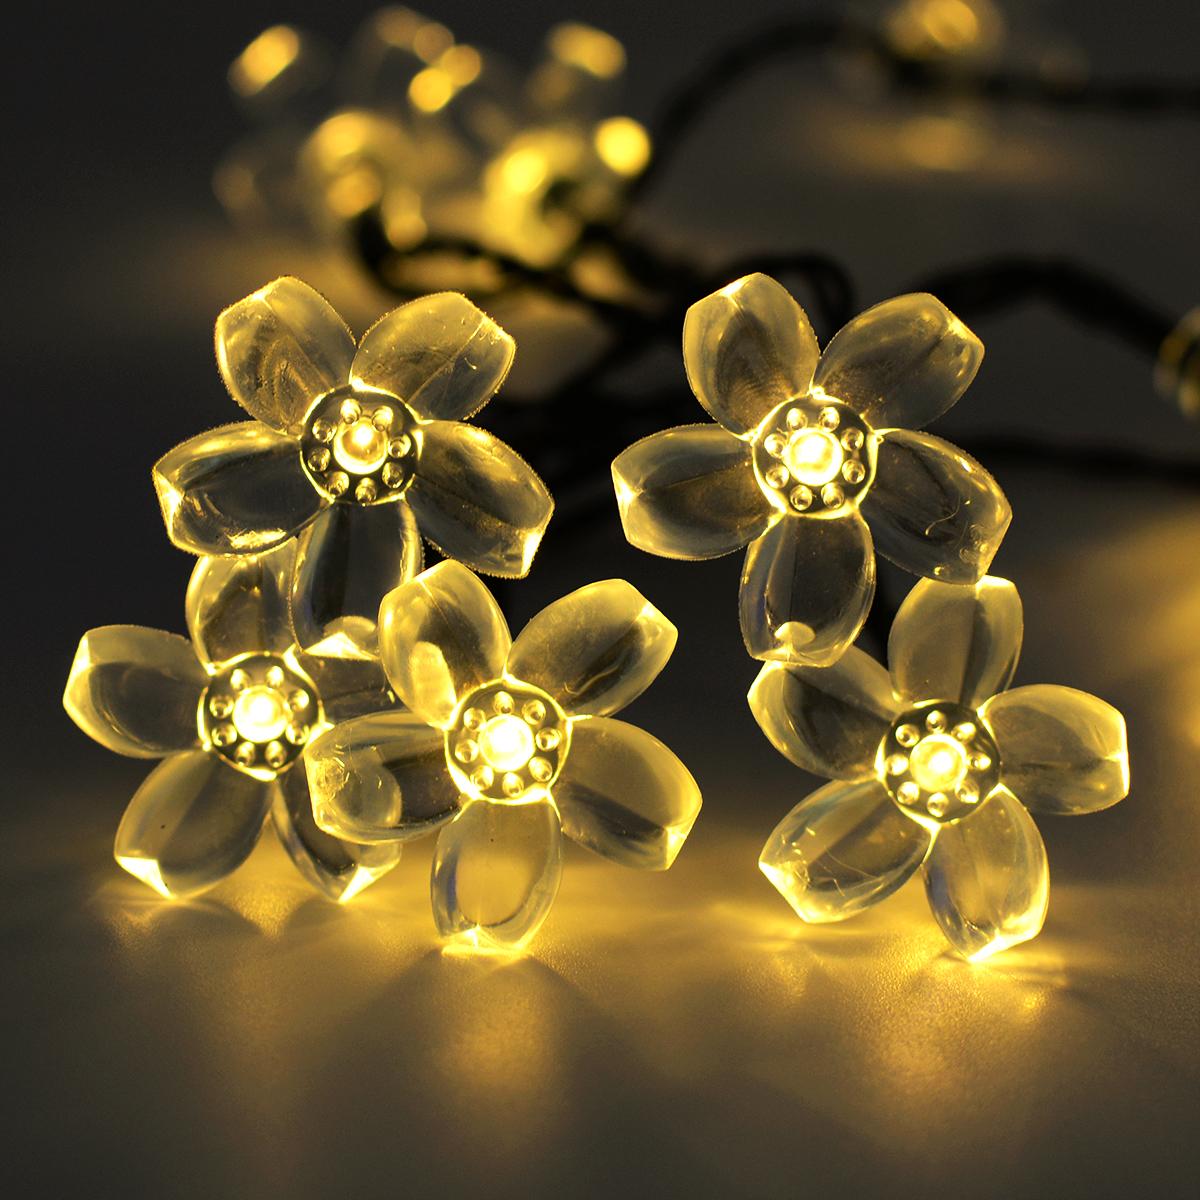 7M 50LEDs Waterproof Peach Blossom Shape Solar Powered String Light for Decor warm light_(ME0003902)